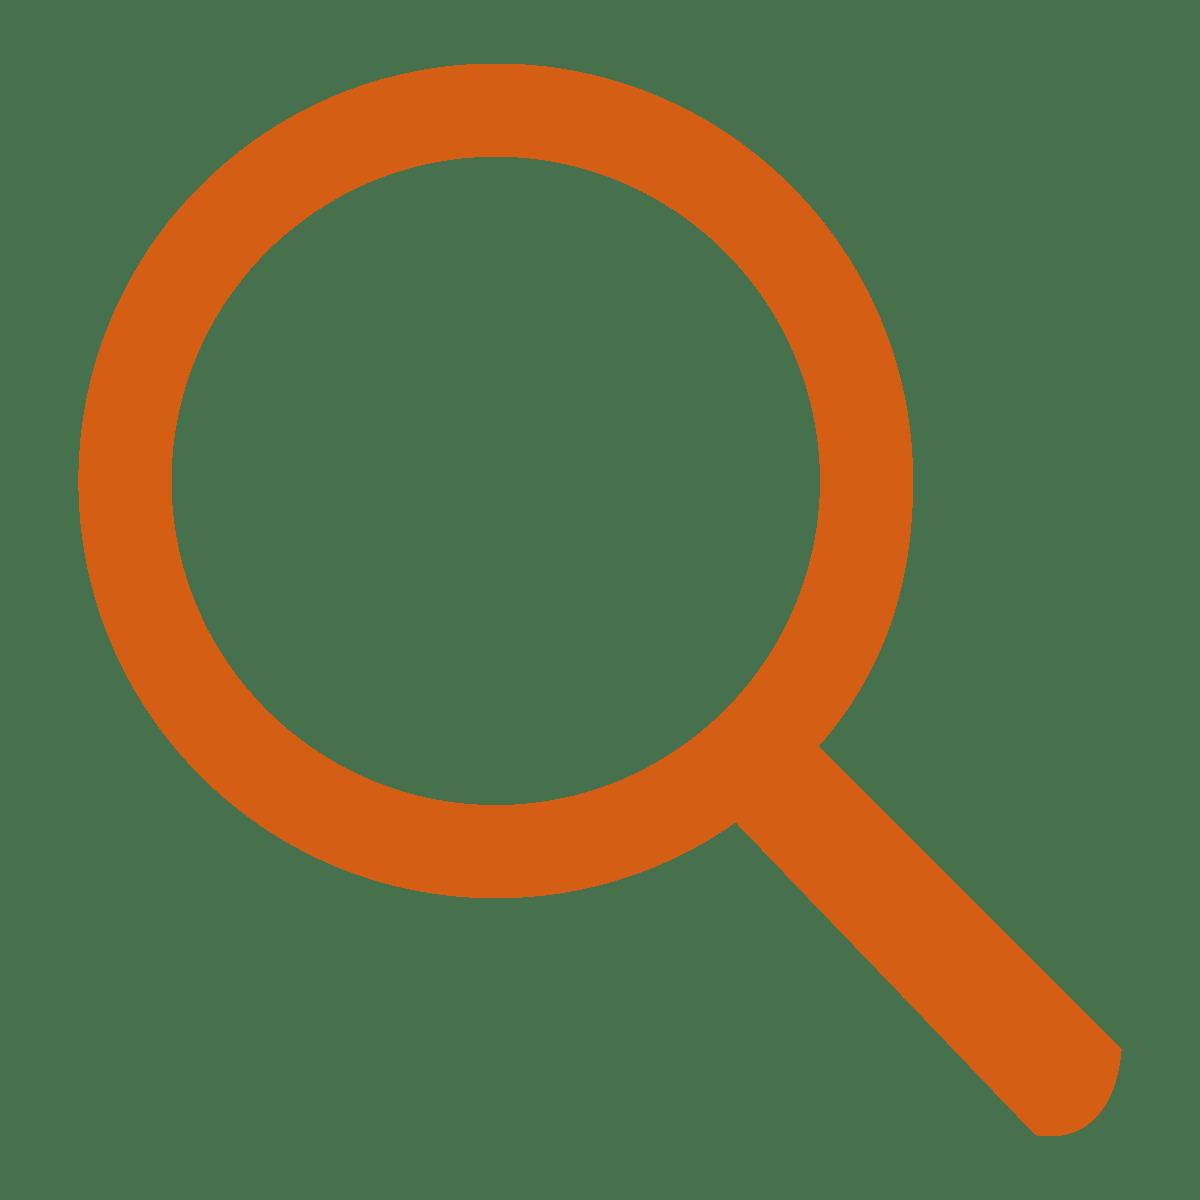 arvense-group-5f-methodology-step-1-find-orange